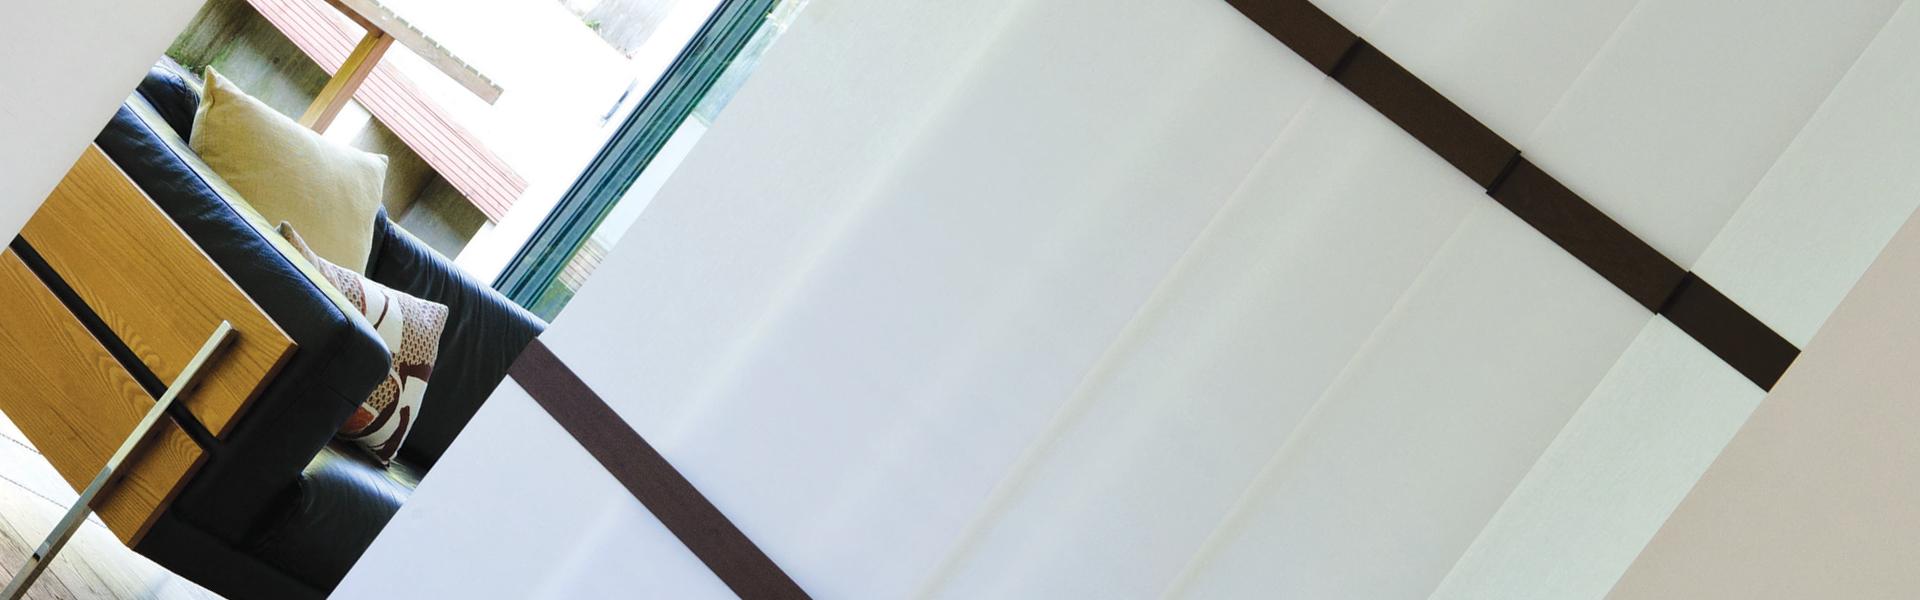 panel-blind-3